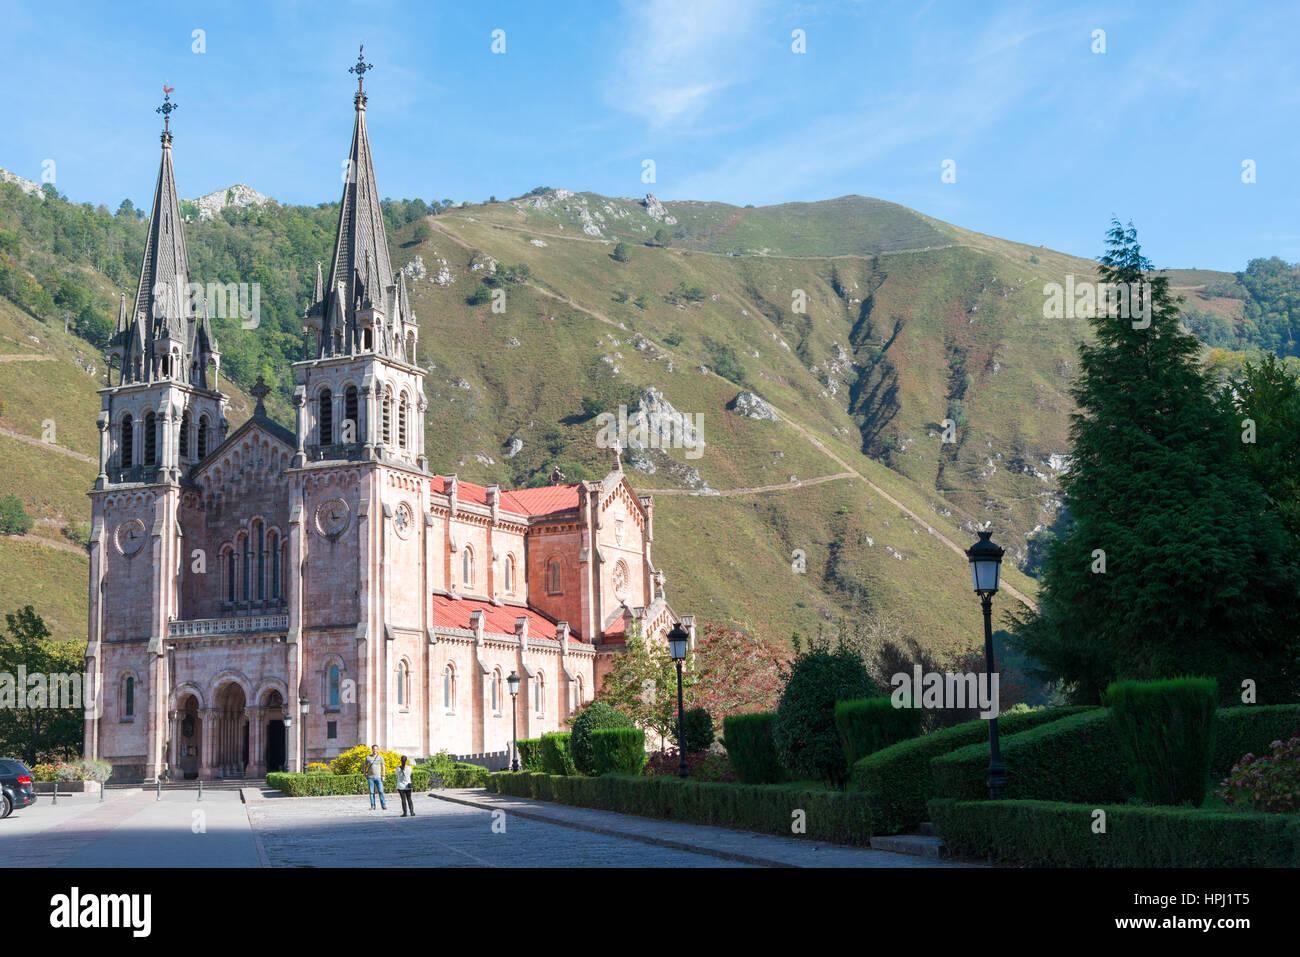 The Sanctuary of Covadonga or the Santa Cueva de Covadonga a Catholic sanctuary located in Asturias, northern Spain - Stock Image